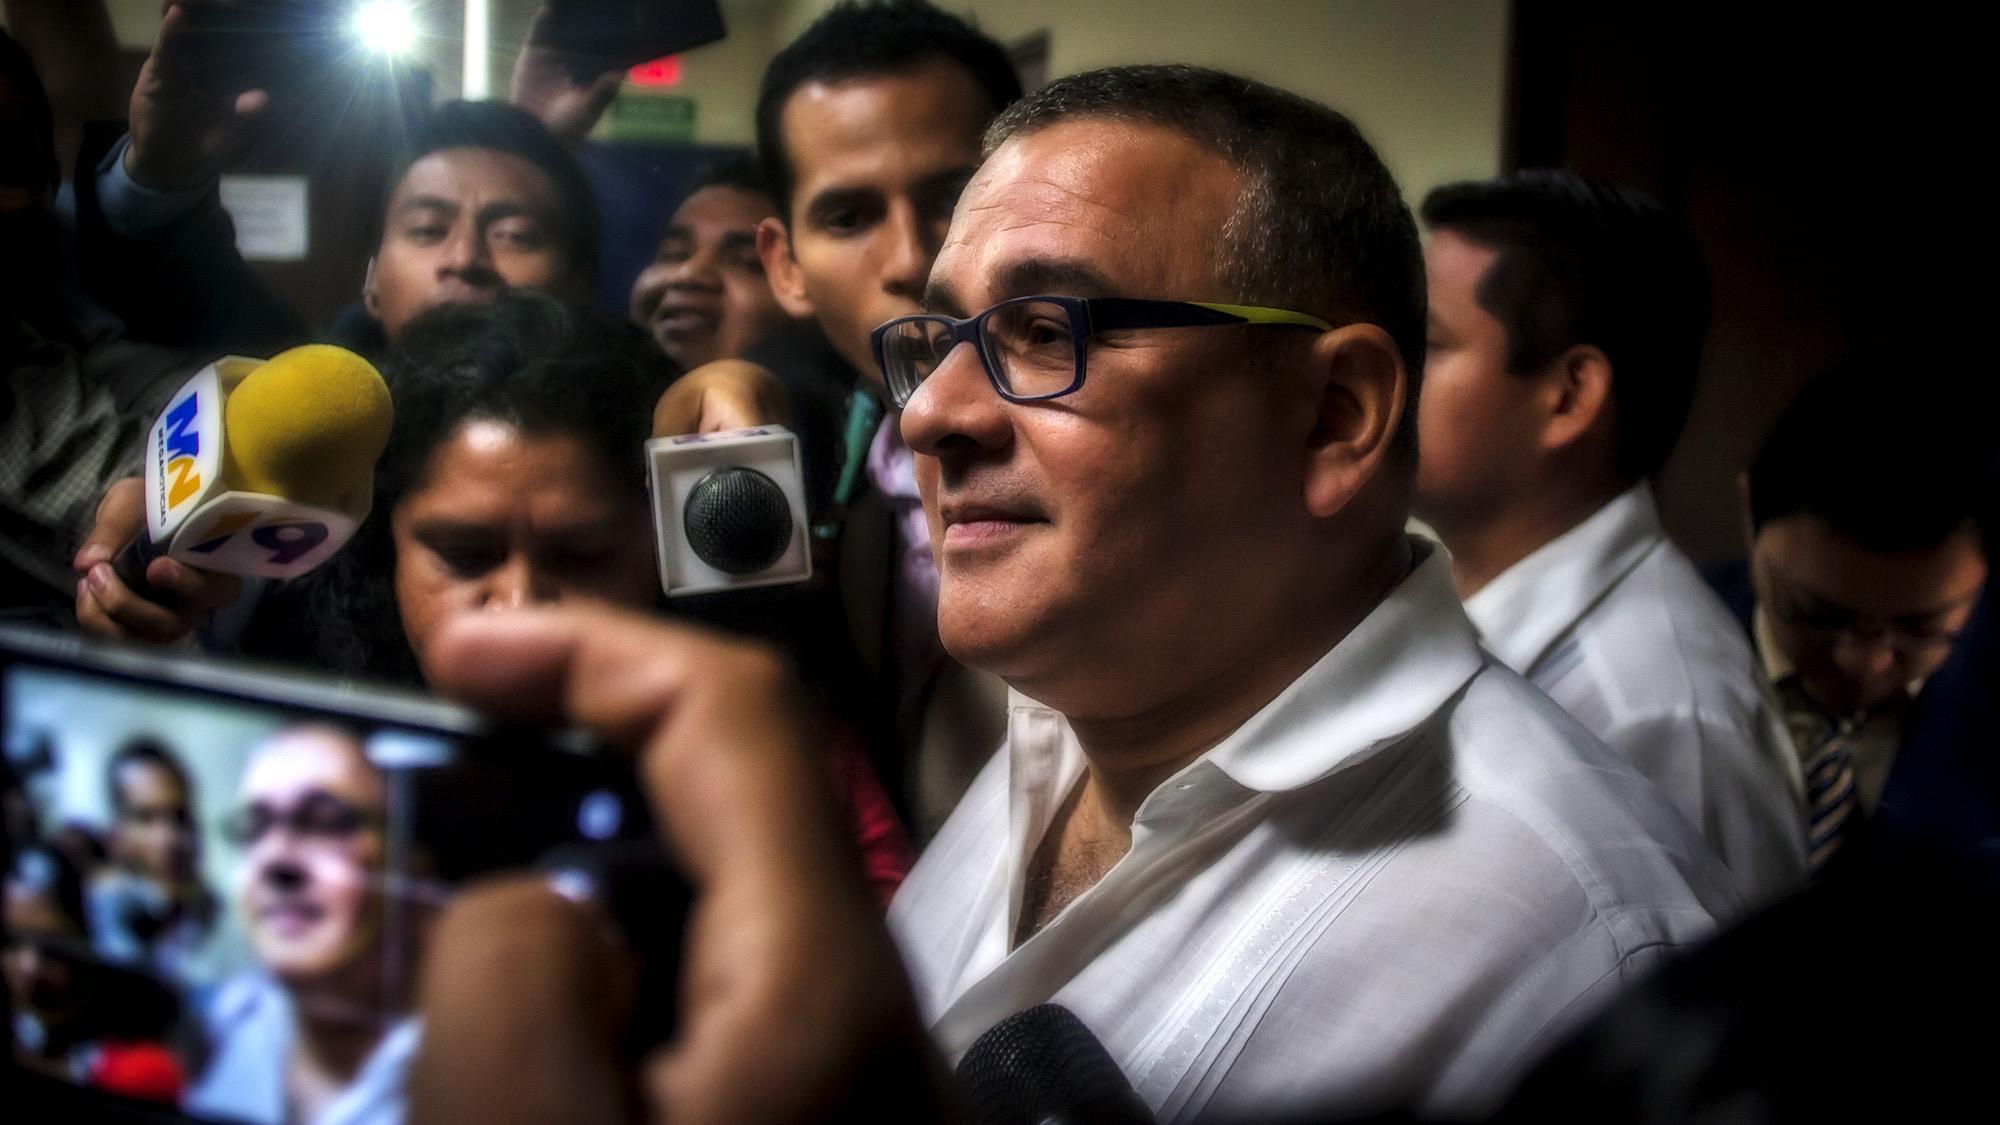 Peritajes validan que expresidente Funes confesó haber sobornado diputados